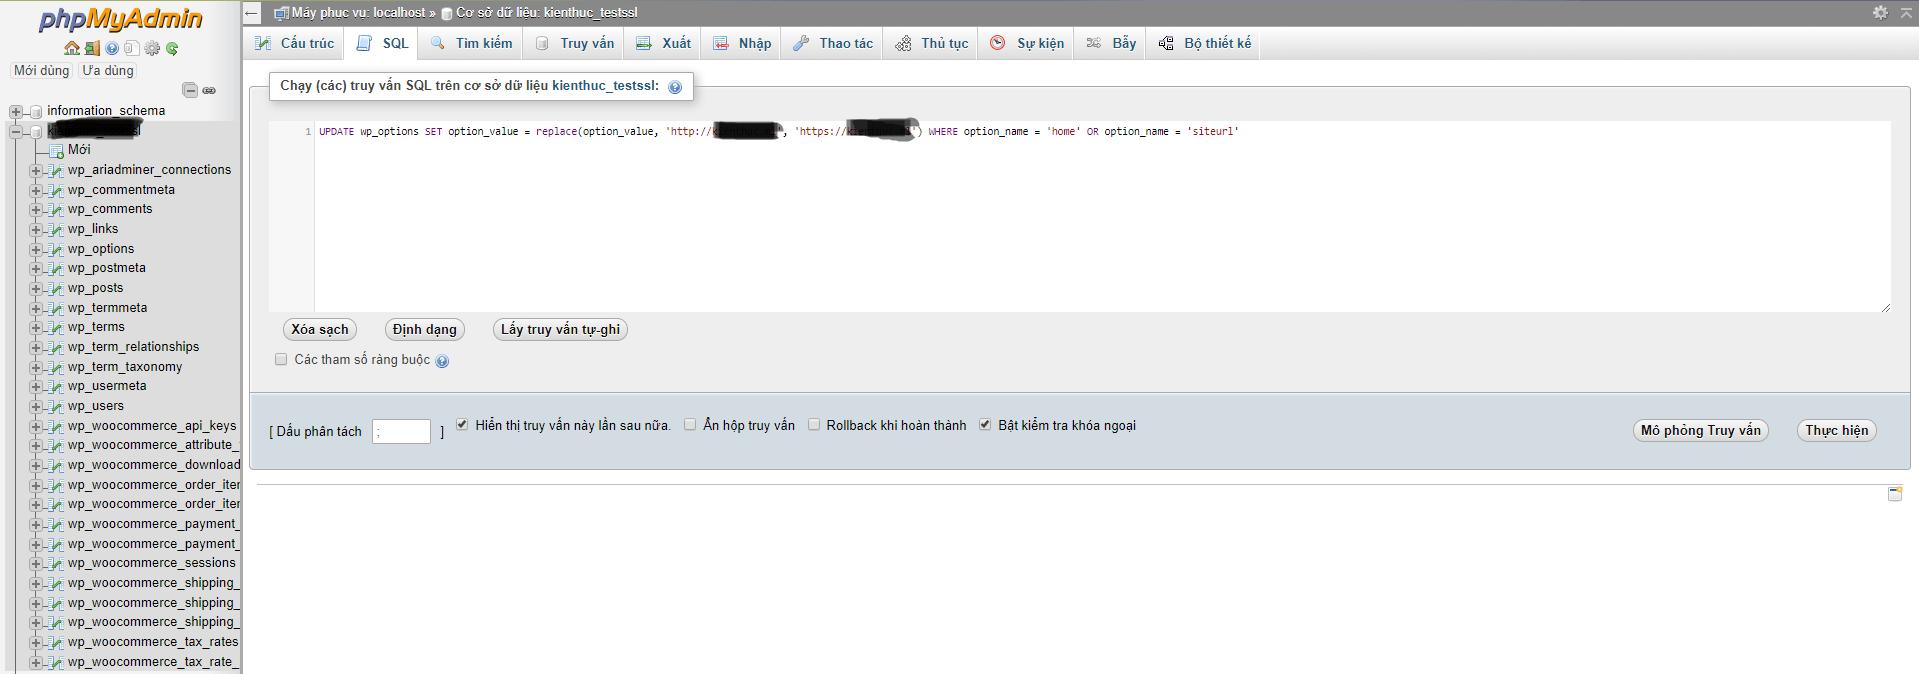 phpmyadmin query sql